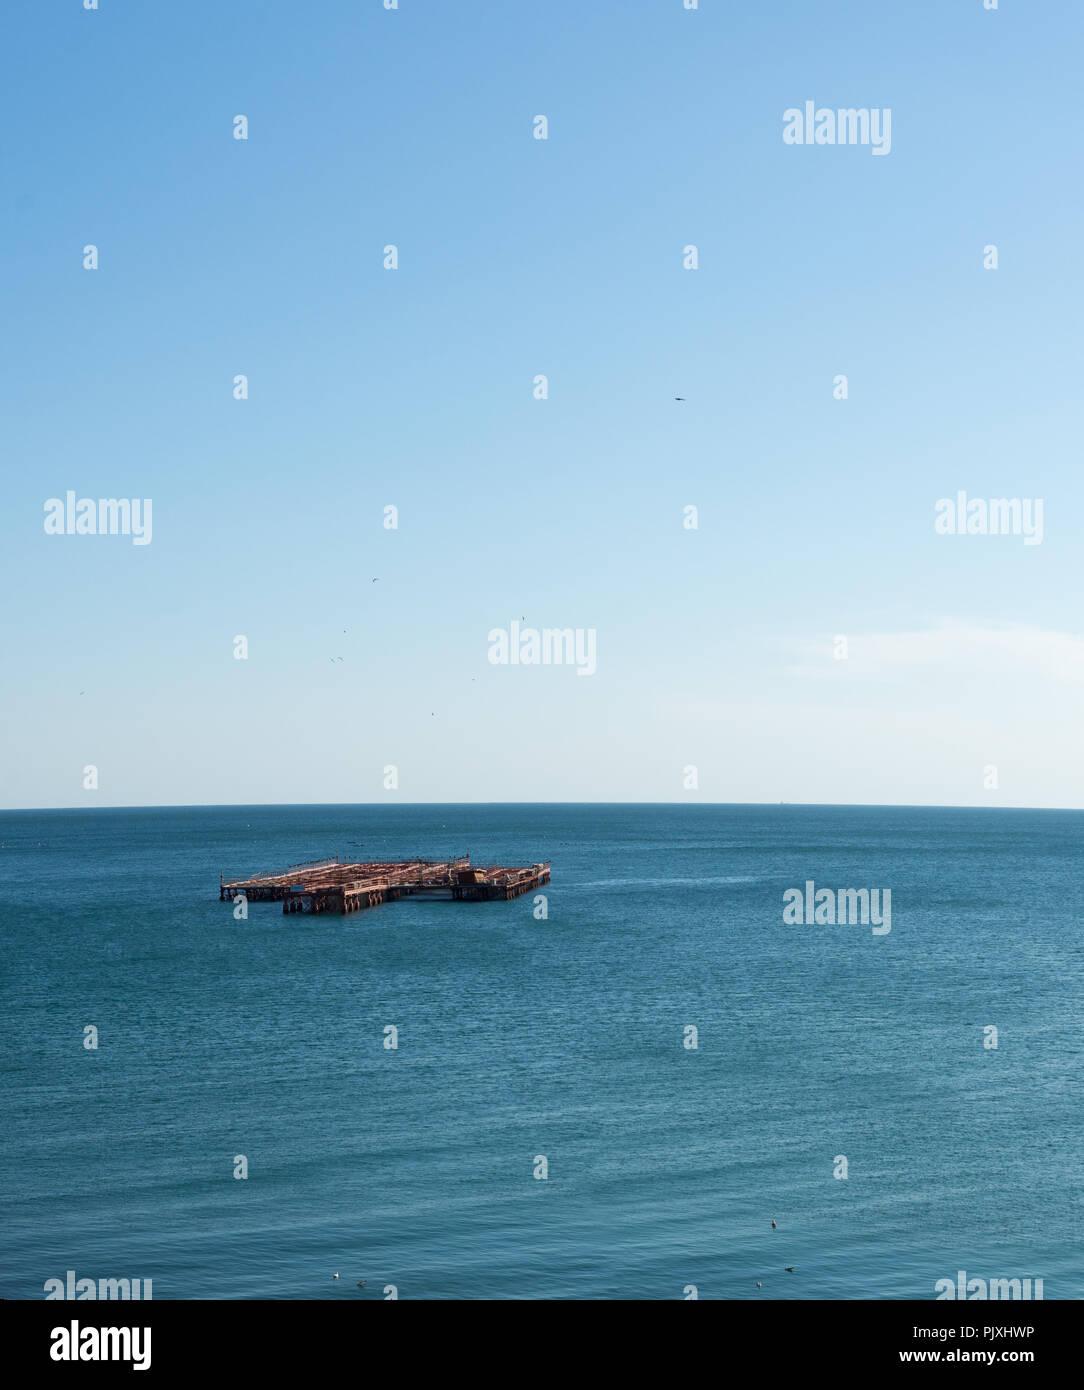 Vista panorámica de la granja de mariscos en el Mar Negro, Bulgaria Imagen De Stock